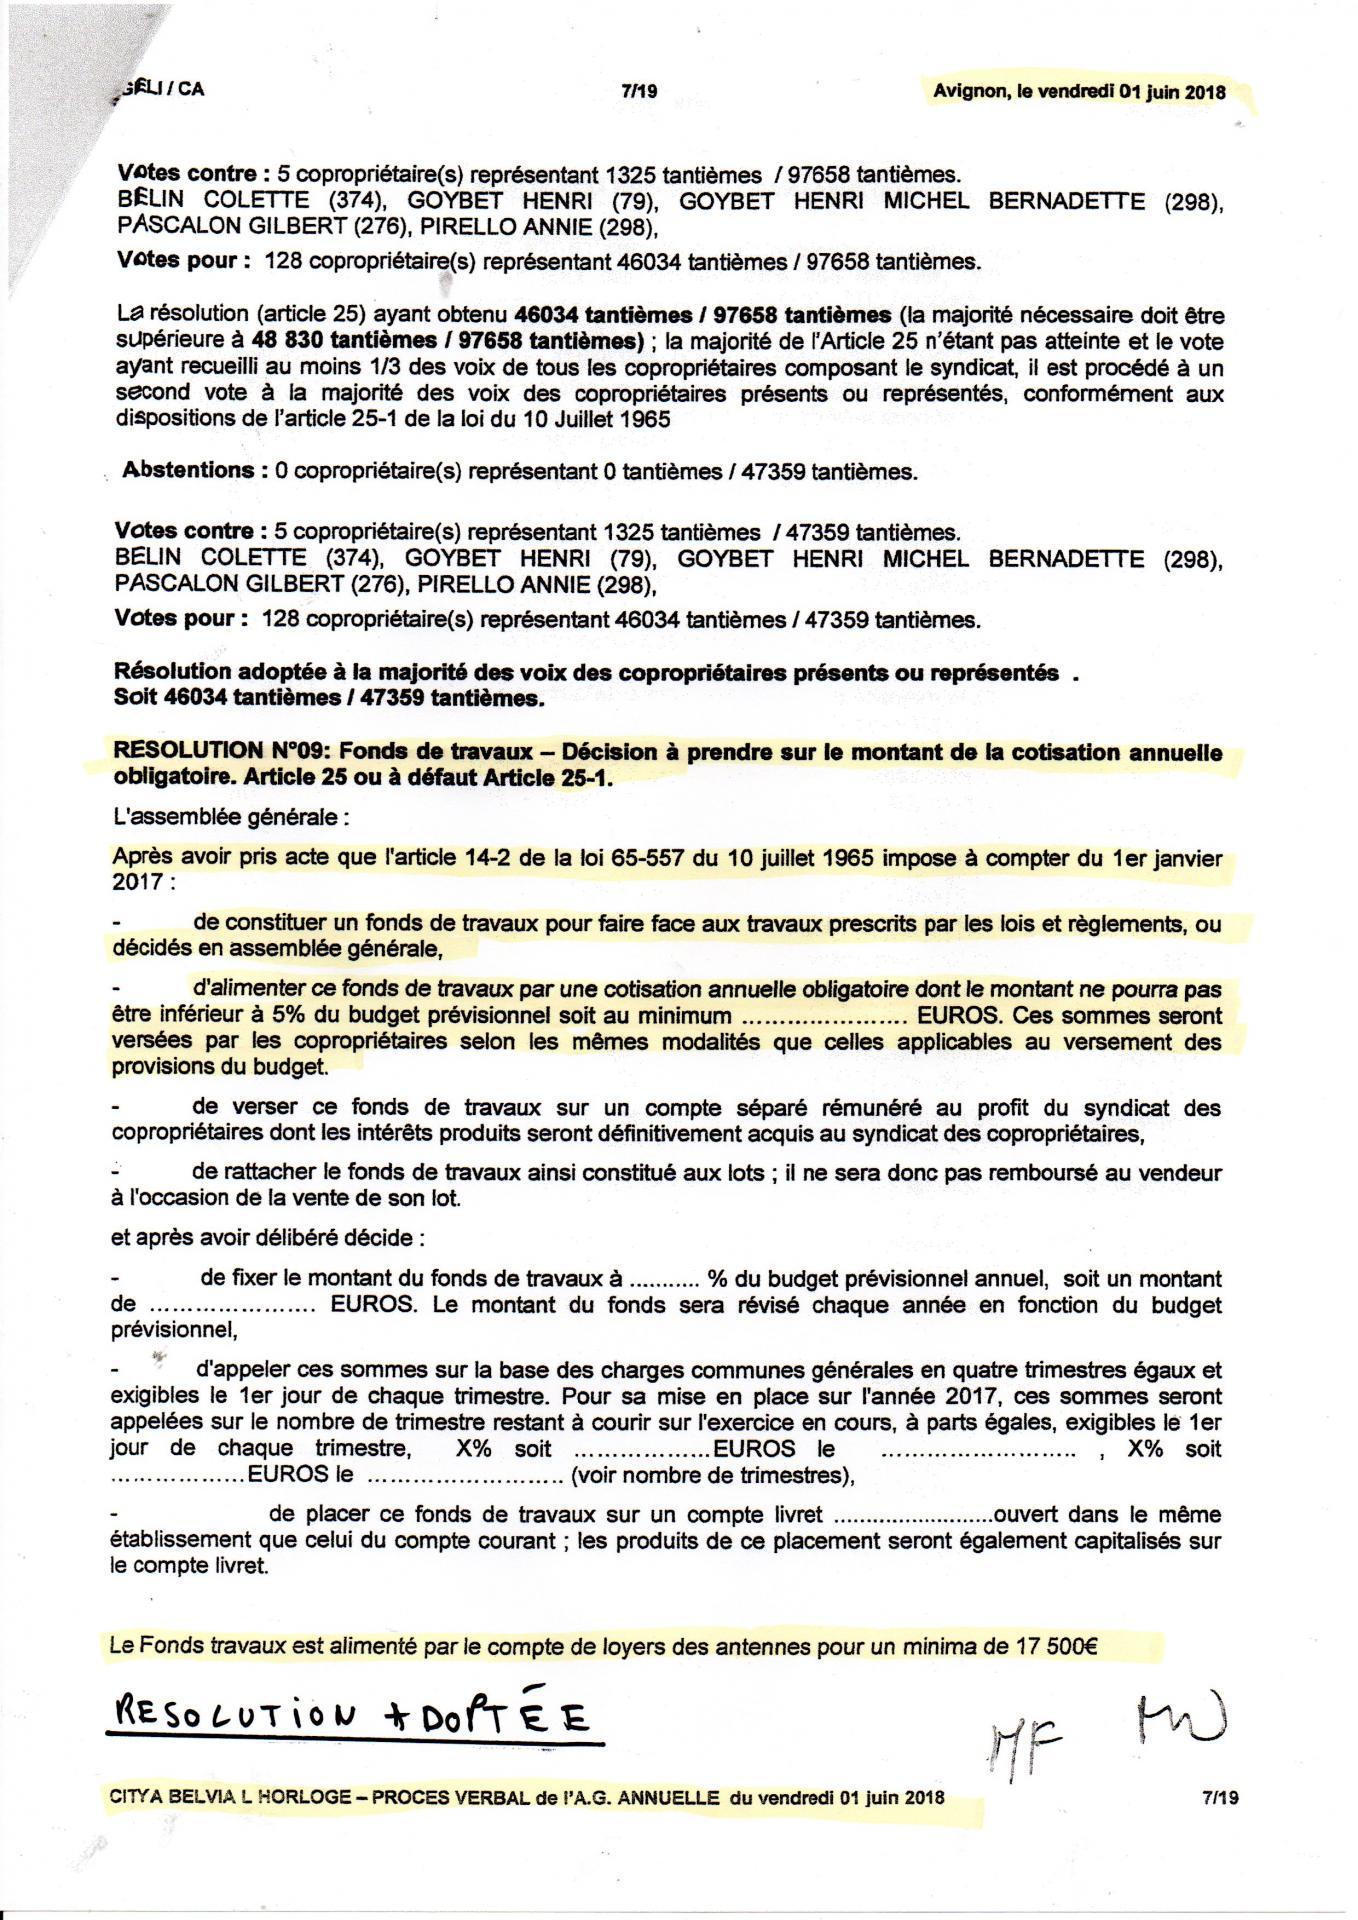 AG 06 2018 transfert loyers antennes 17000 €vers fonds travaux